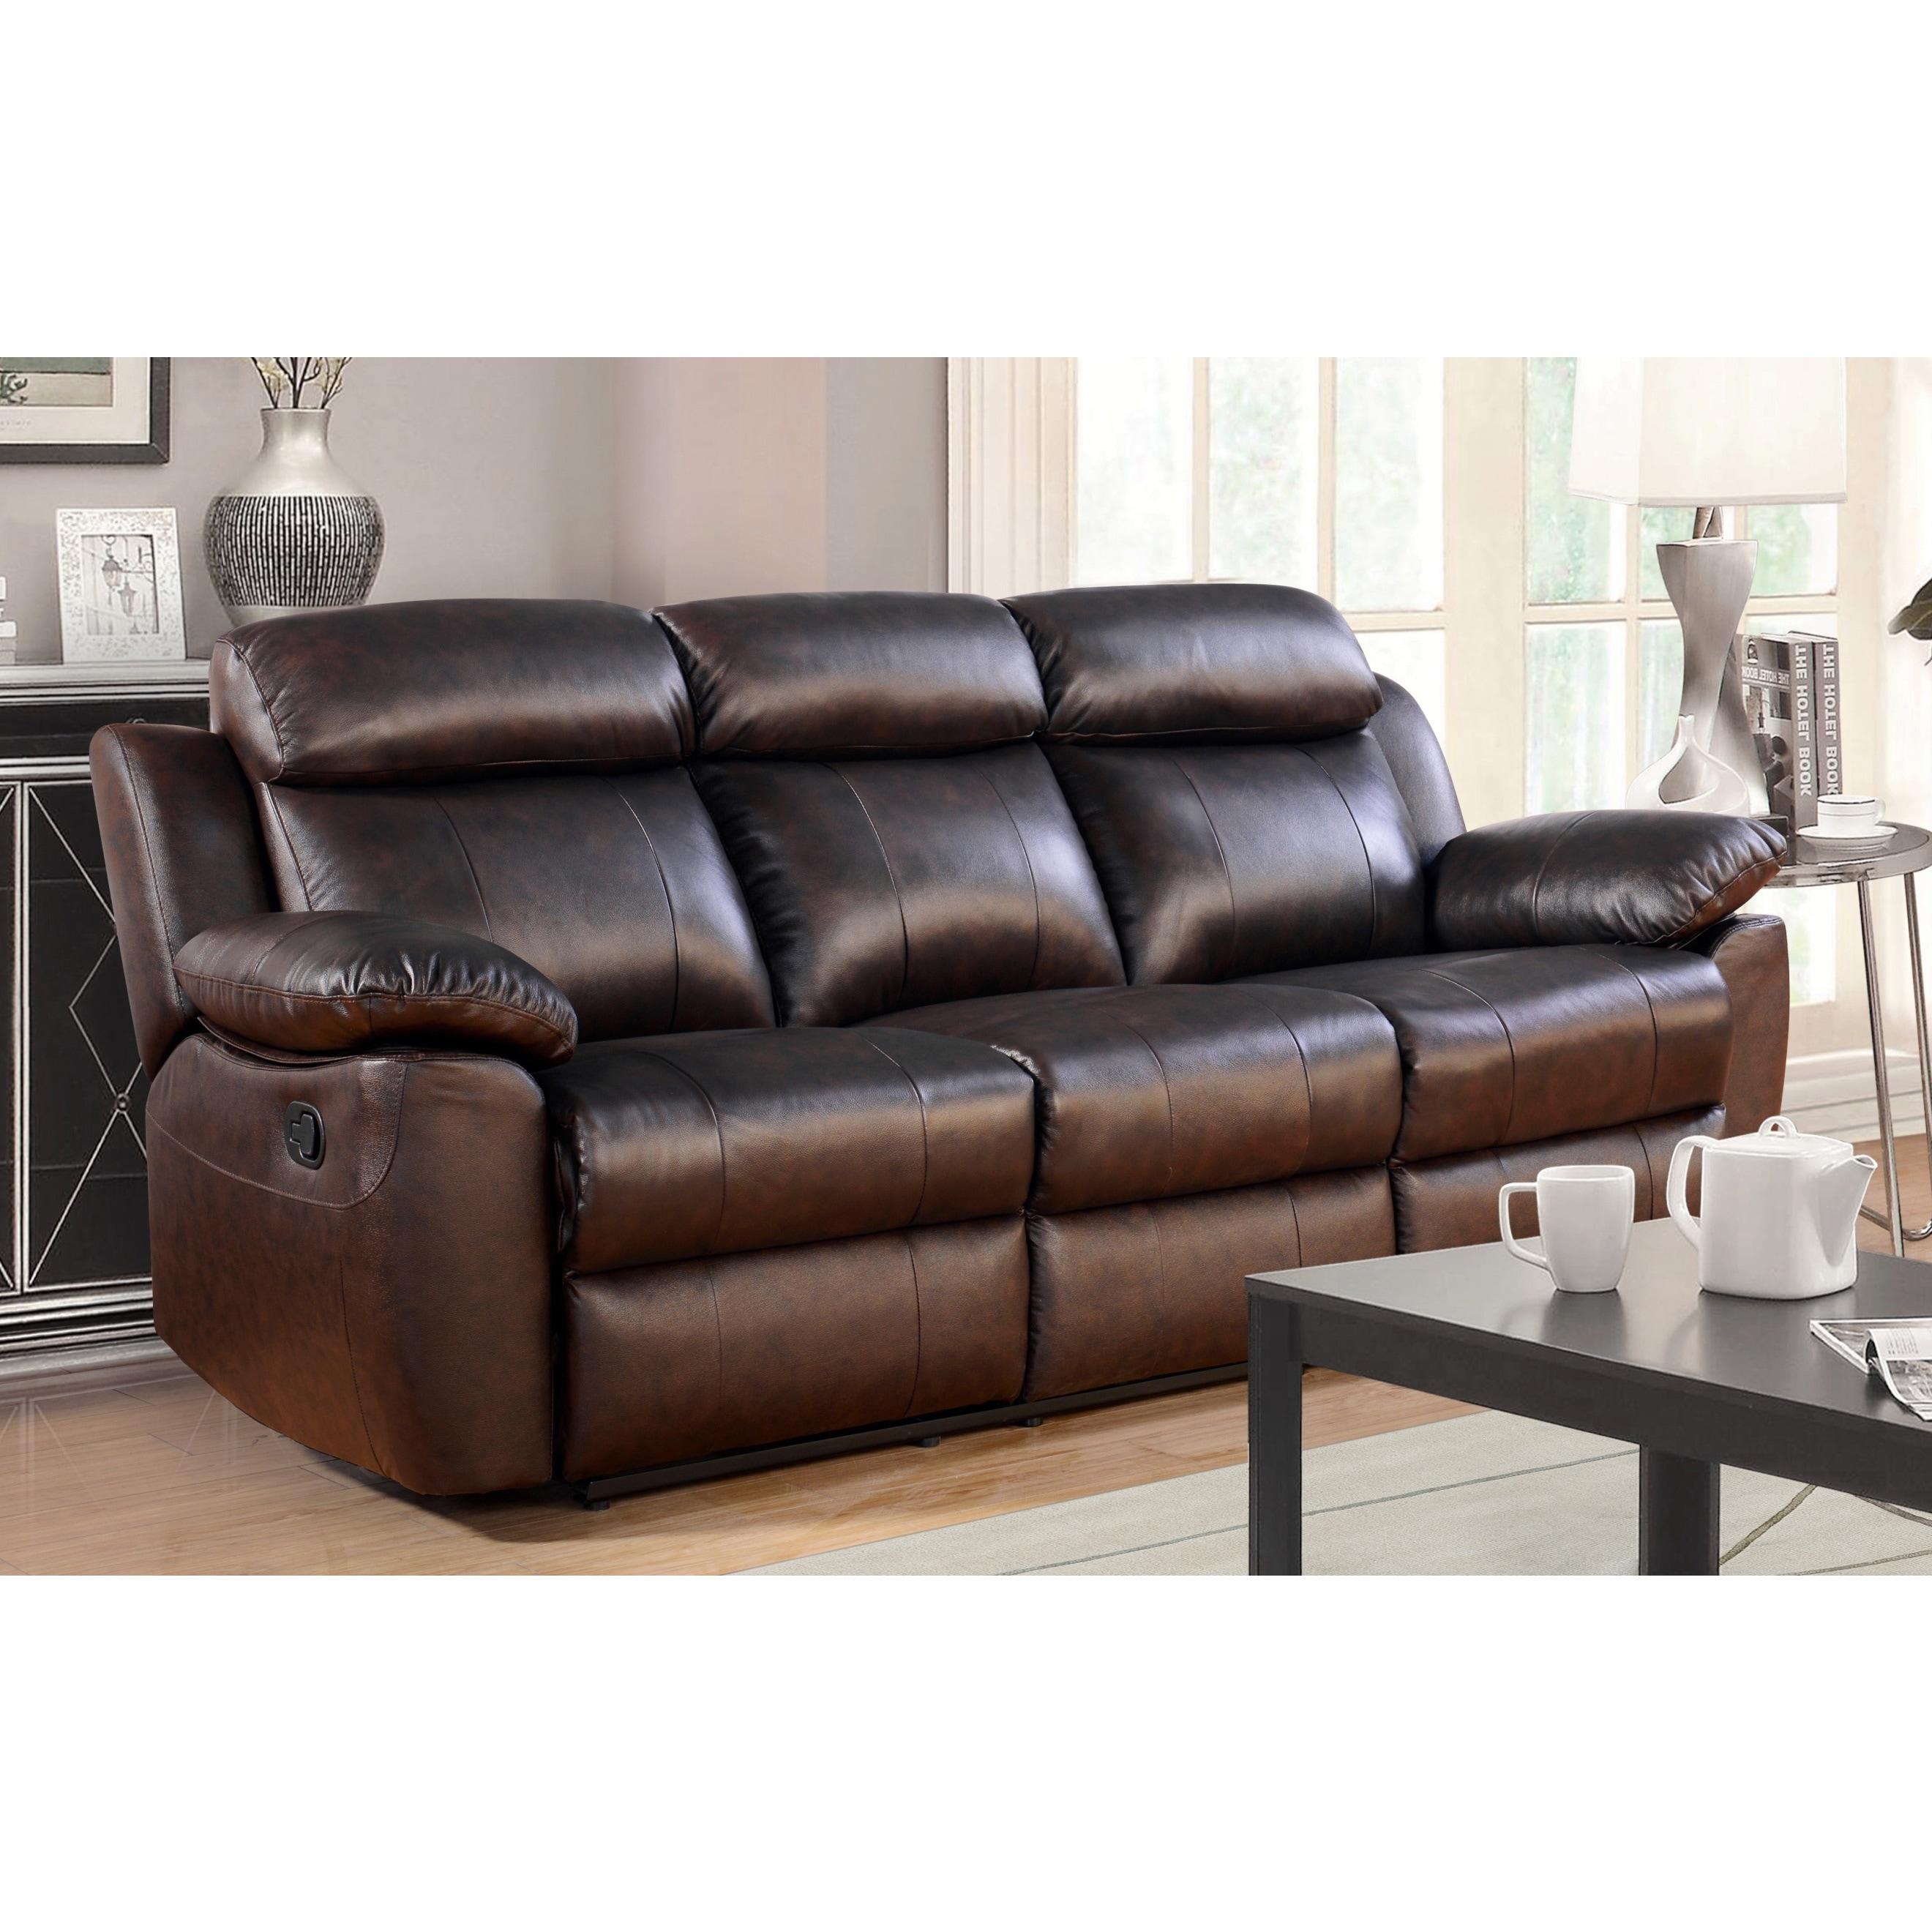 Abbyson Braylen 3 Piece Top Grain Leather Reclining Living Room Sofa Set Ebay